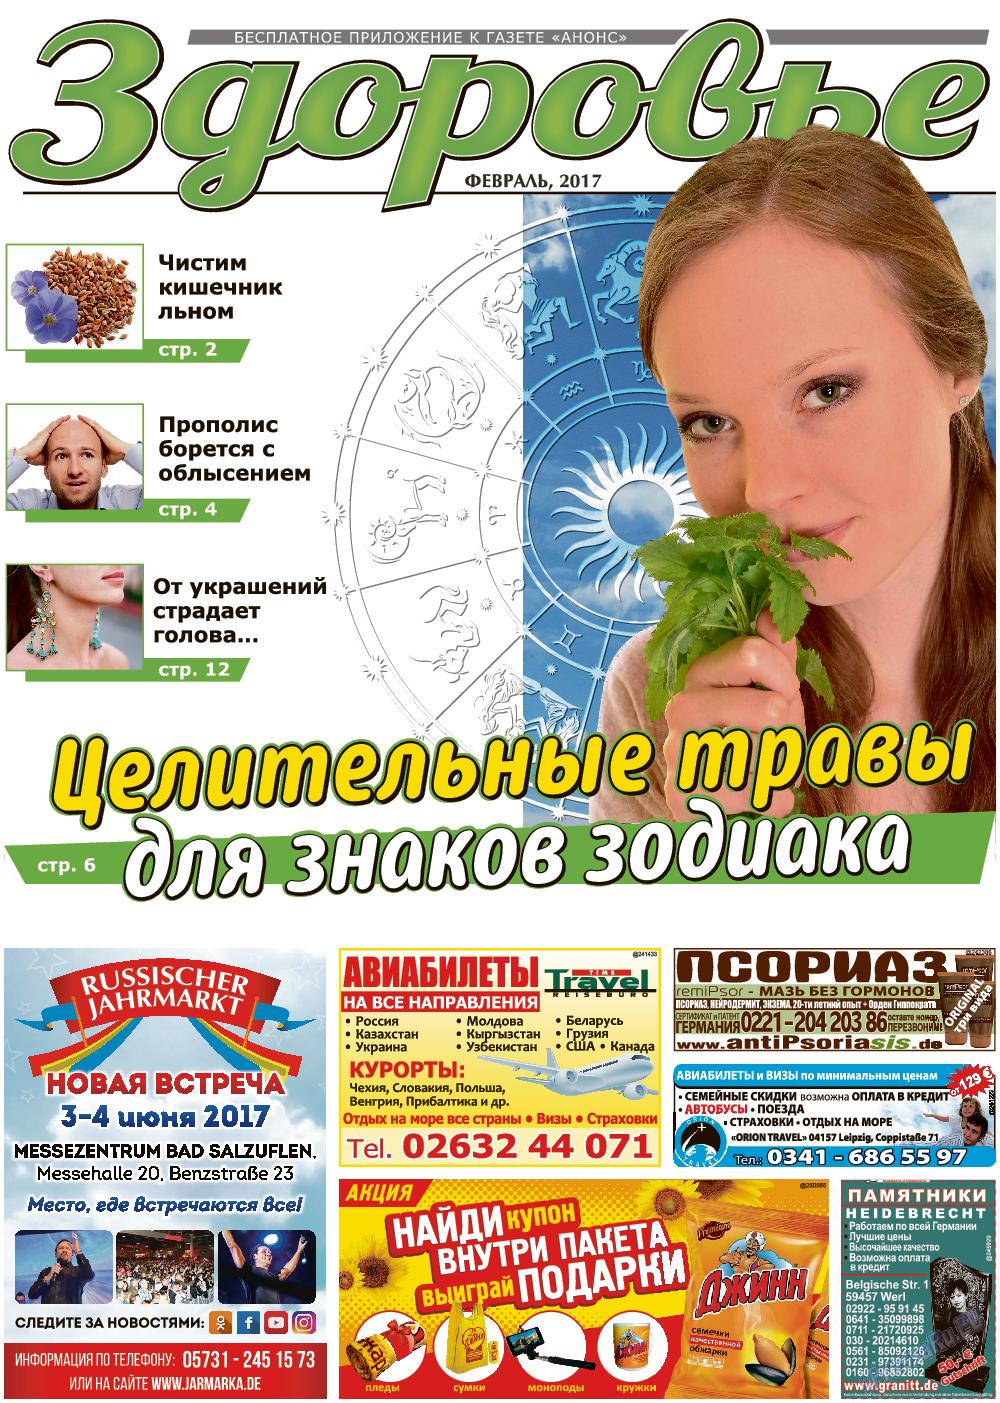 Здоровье (газета). 2017 год, номер 2, стр. 1